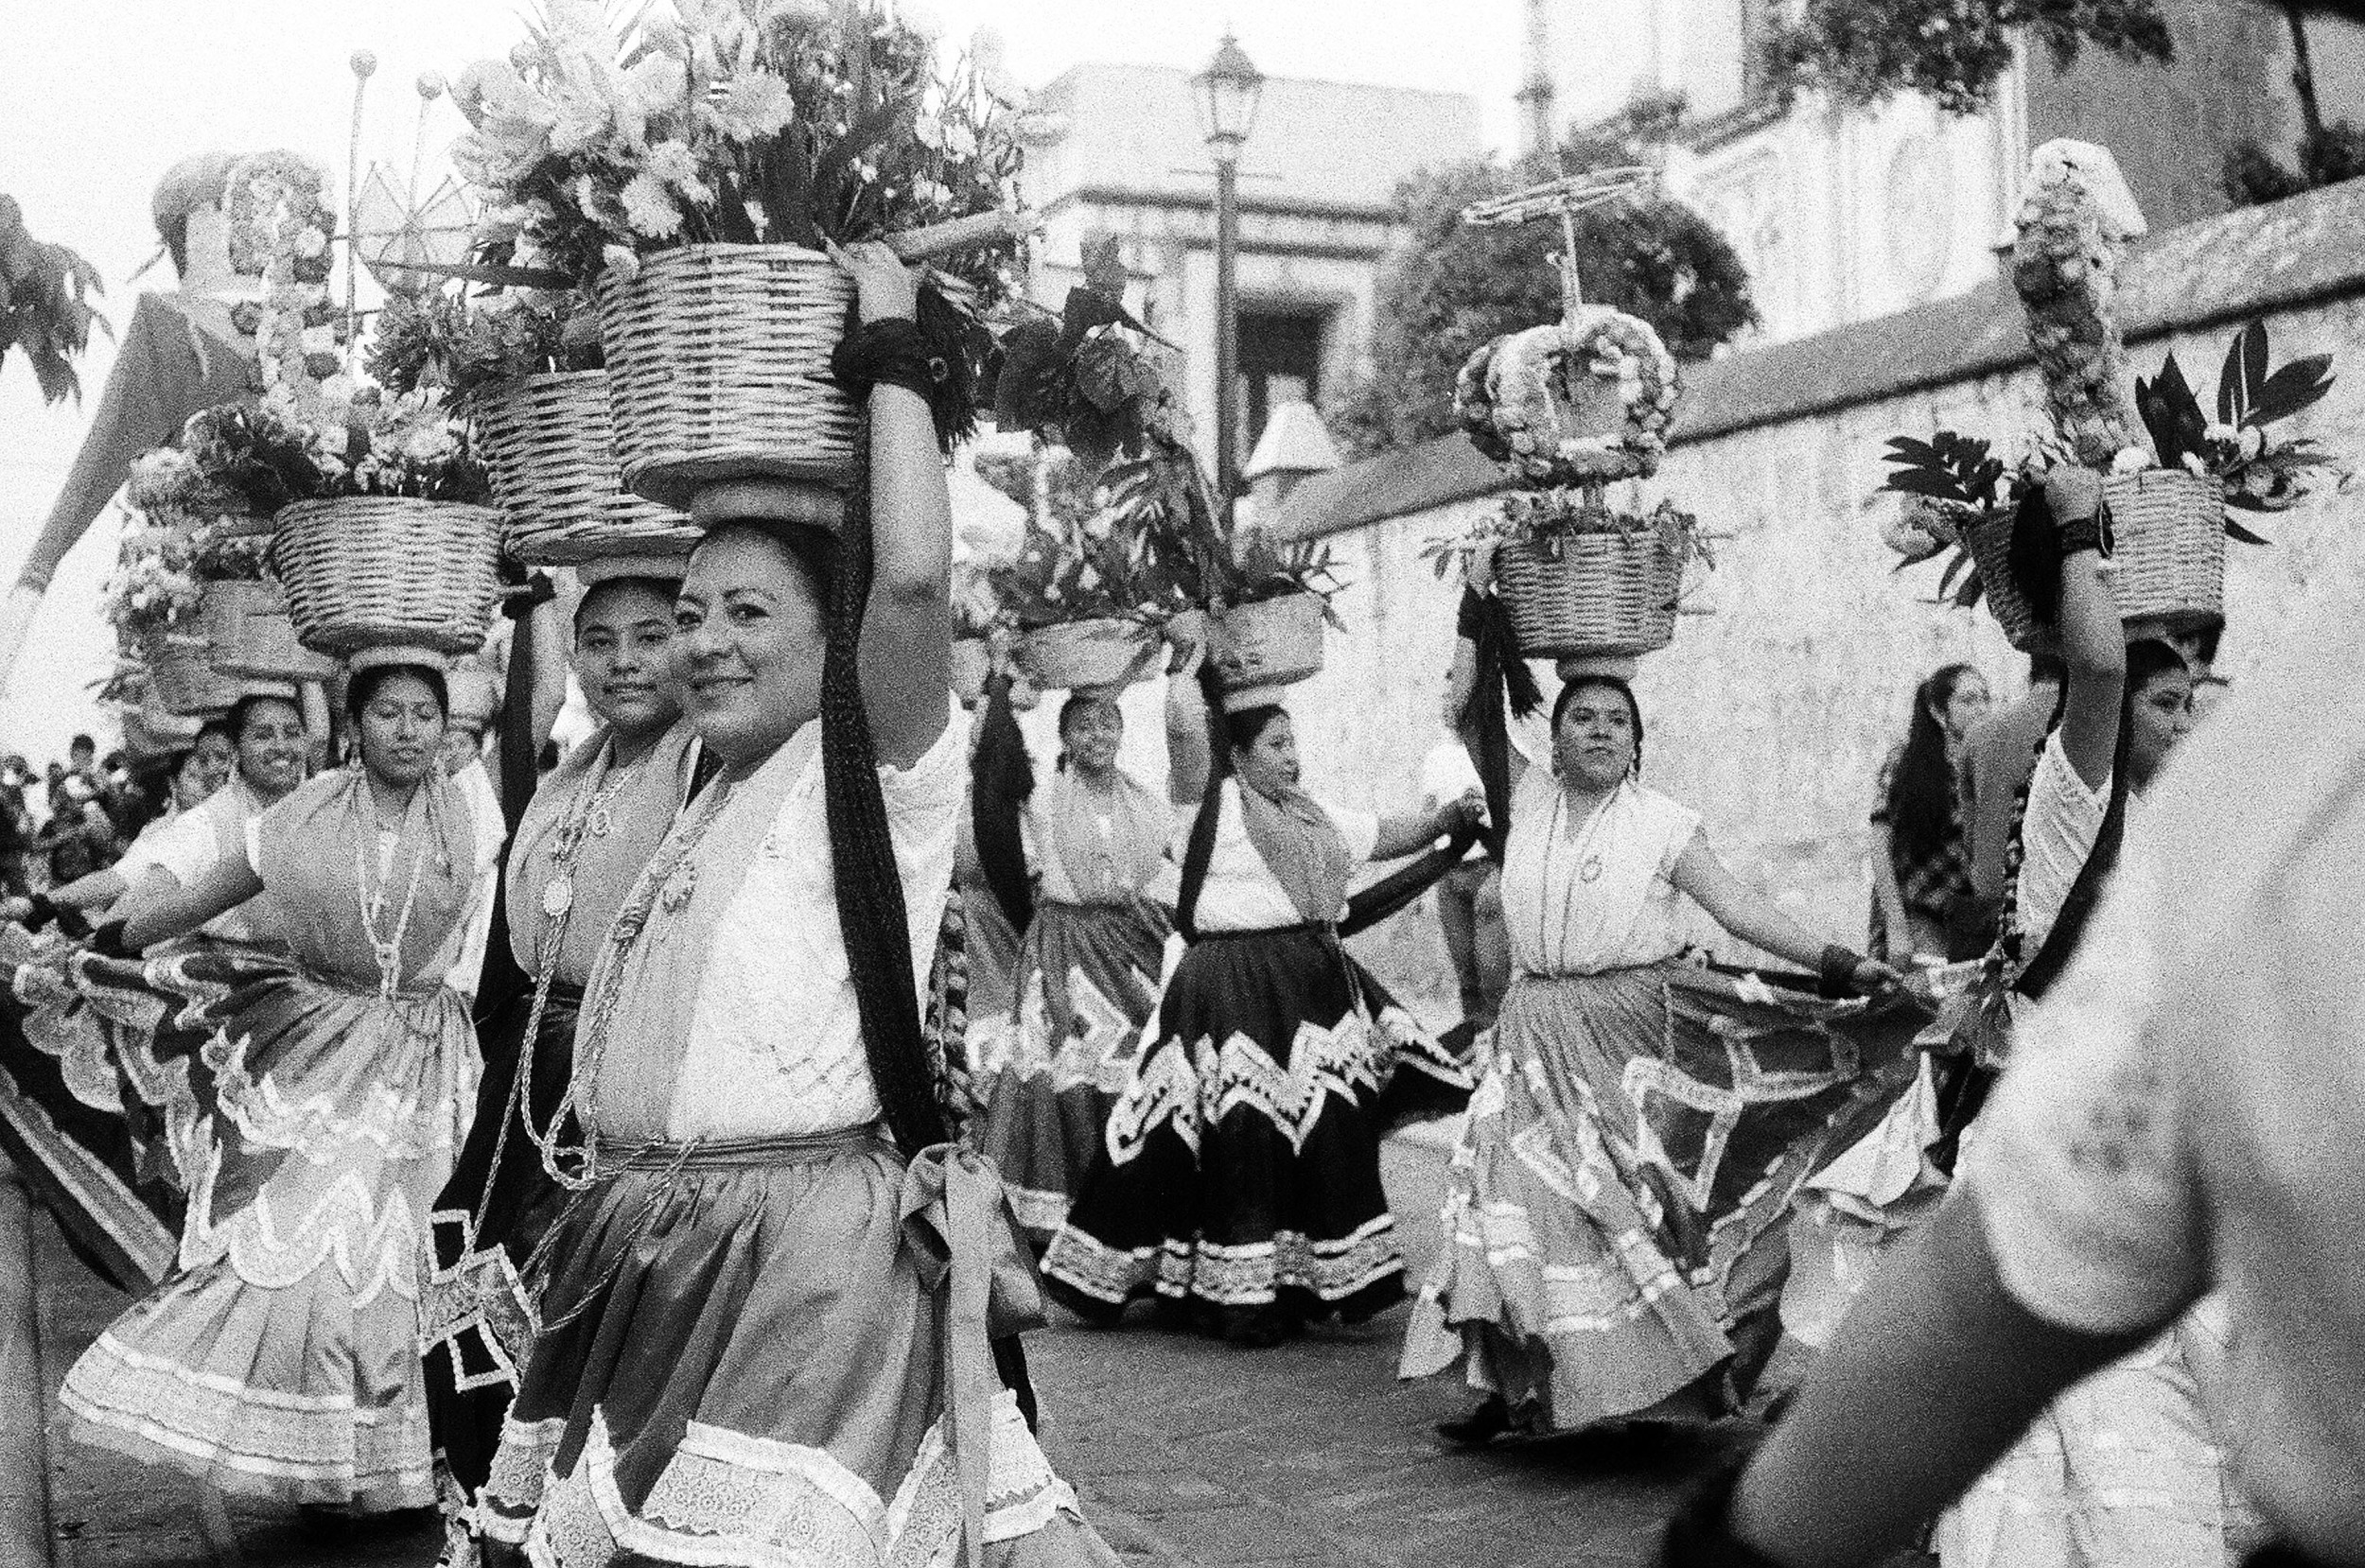 OAX_2016_Folk Parade-1.jpg